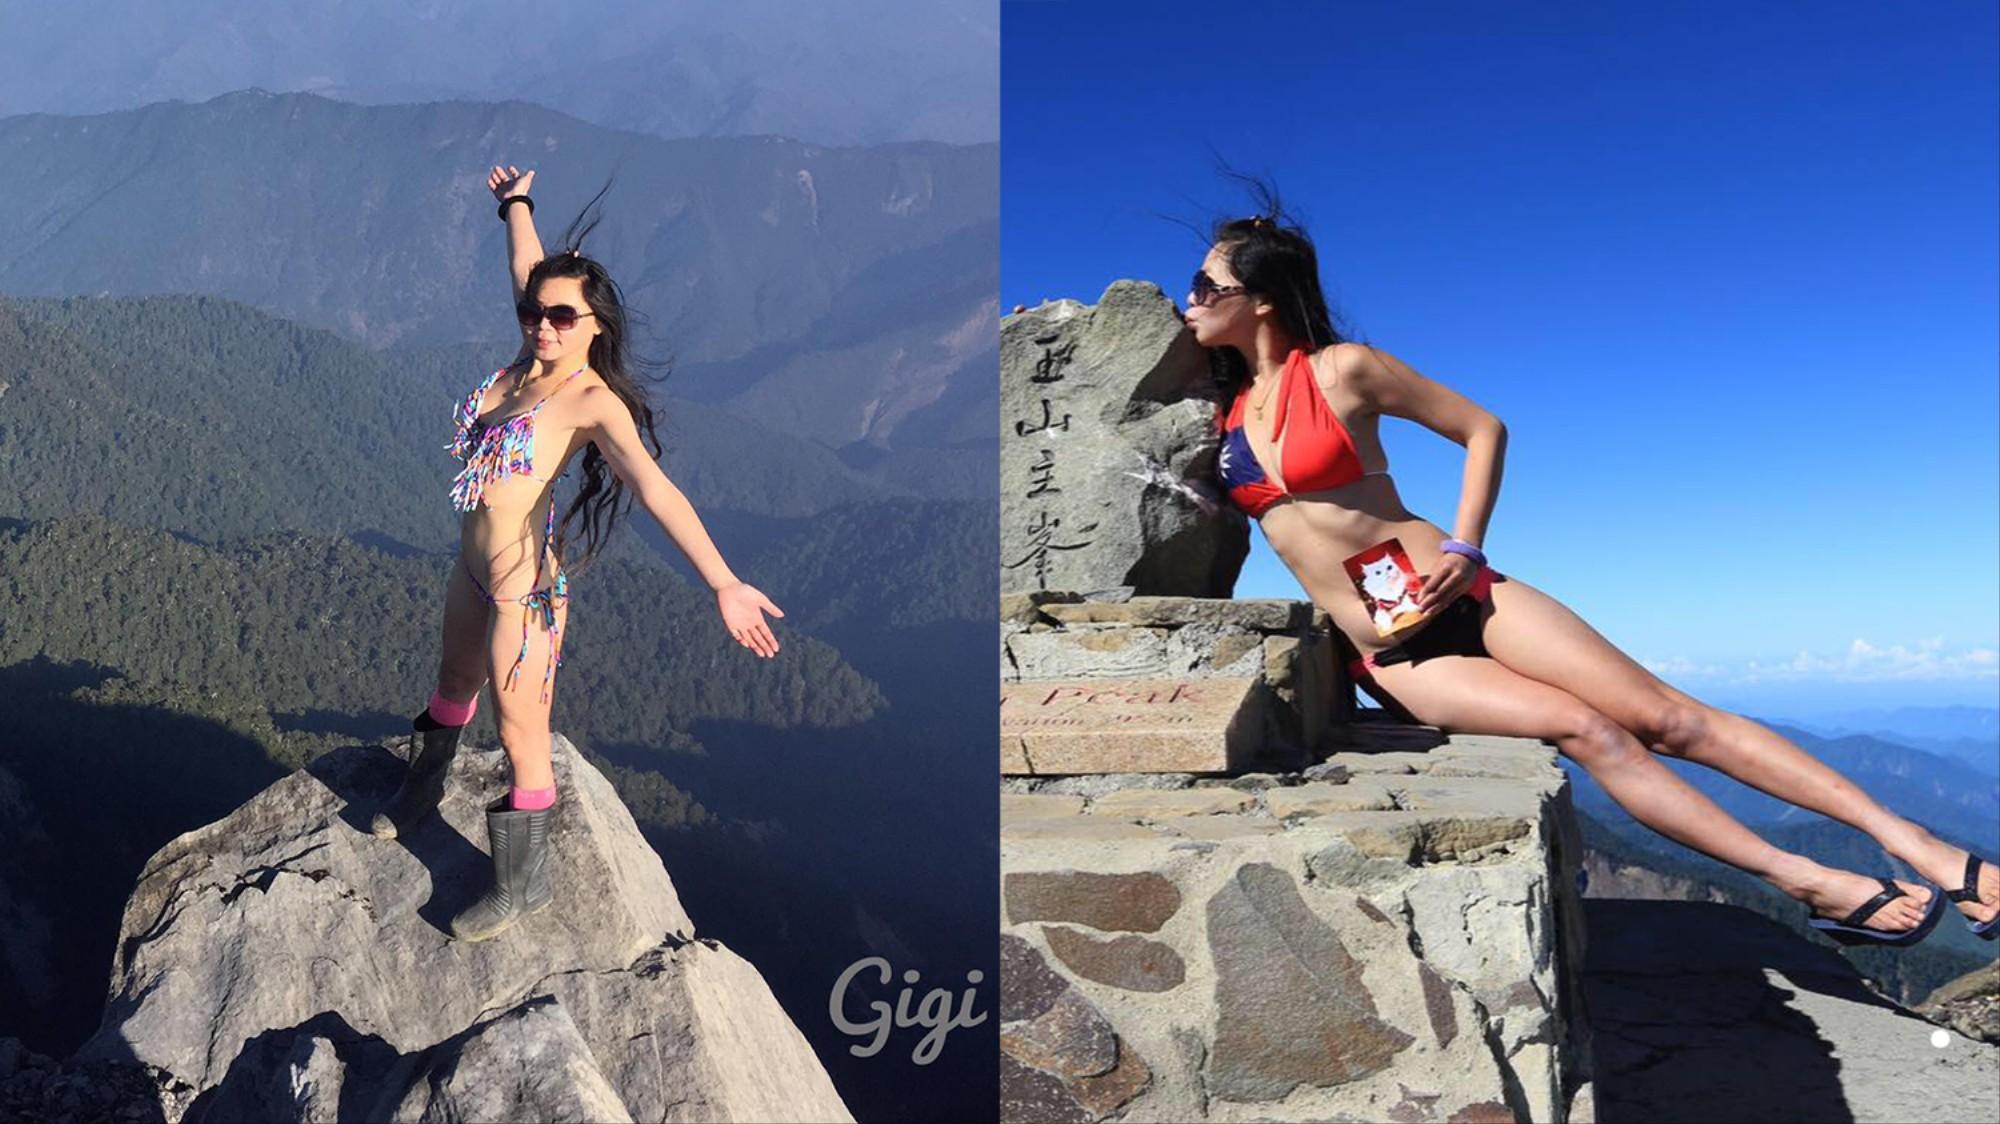 Woman Known as 'Bikini Hiker' Freezes to Death on Mountain